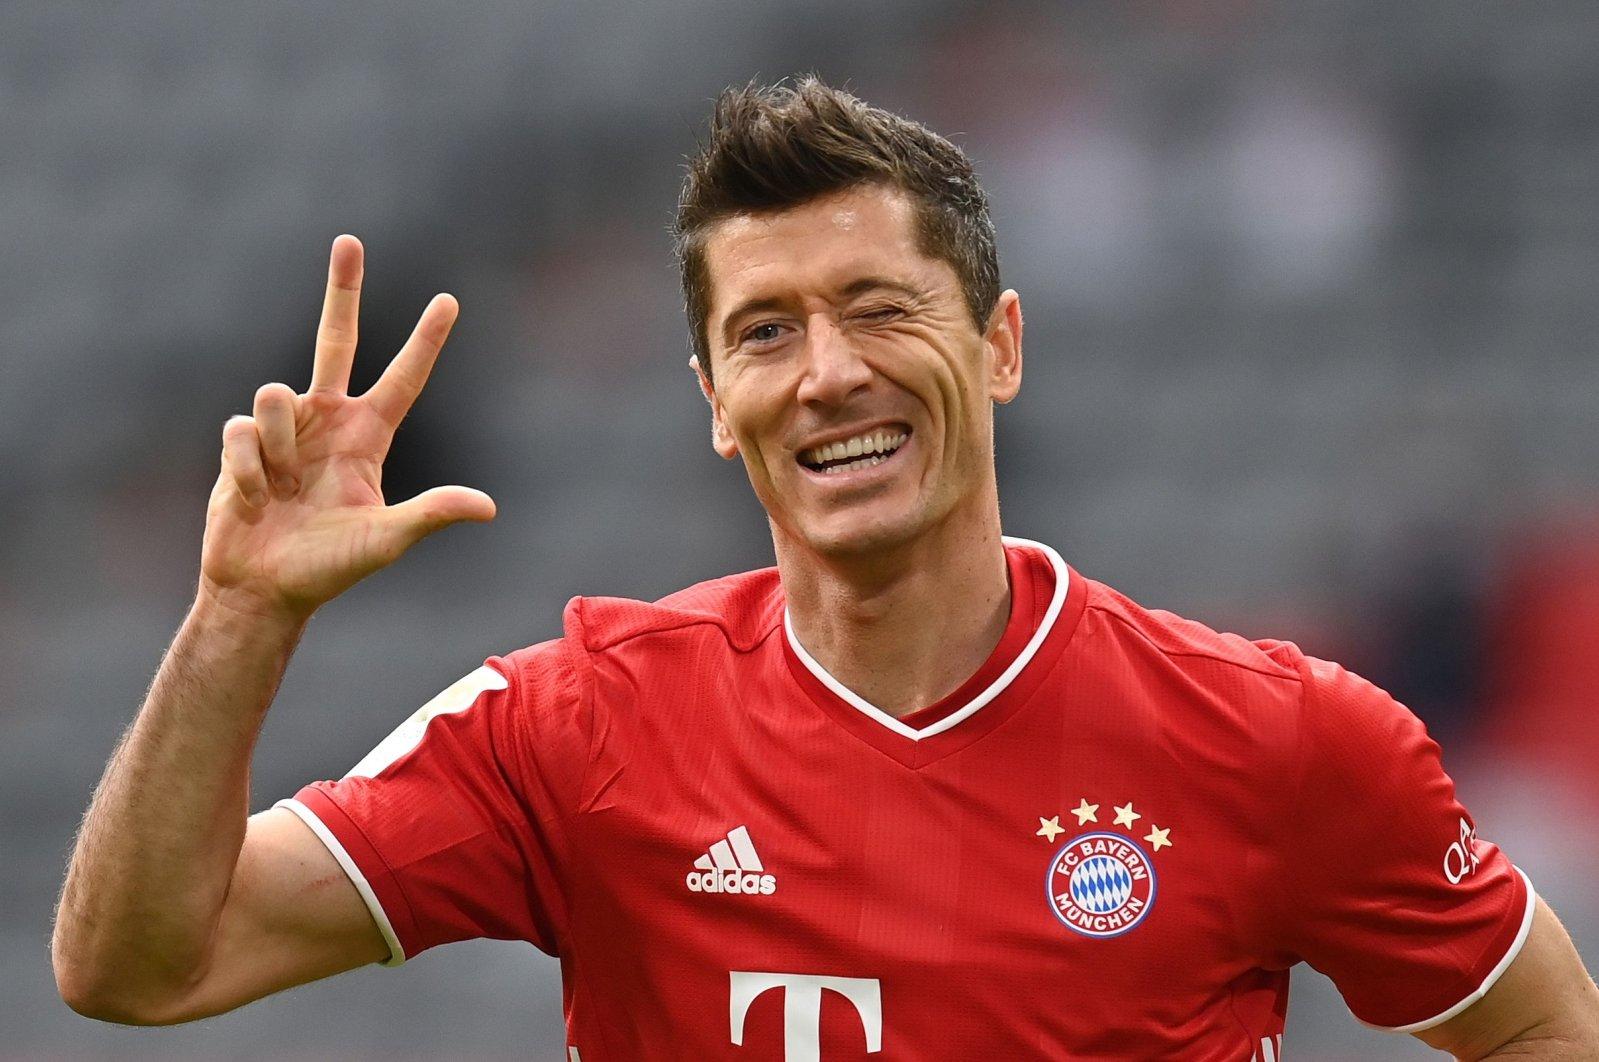 Bayern Munich's Polish forward Robert Lewandowski celebrates scoring his third for his hat-trick during the German first division Bundesliga football match against Eintracht Frankfurt on Oct. 24, 2020, in Munich, southern Germany. (AFP Photo)